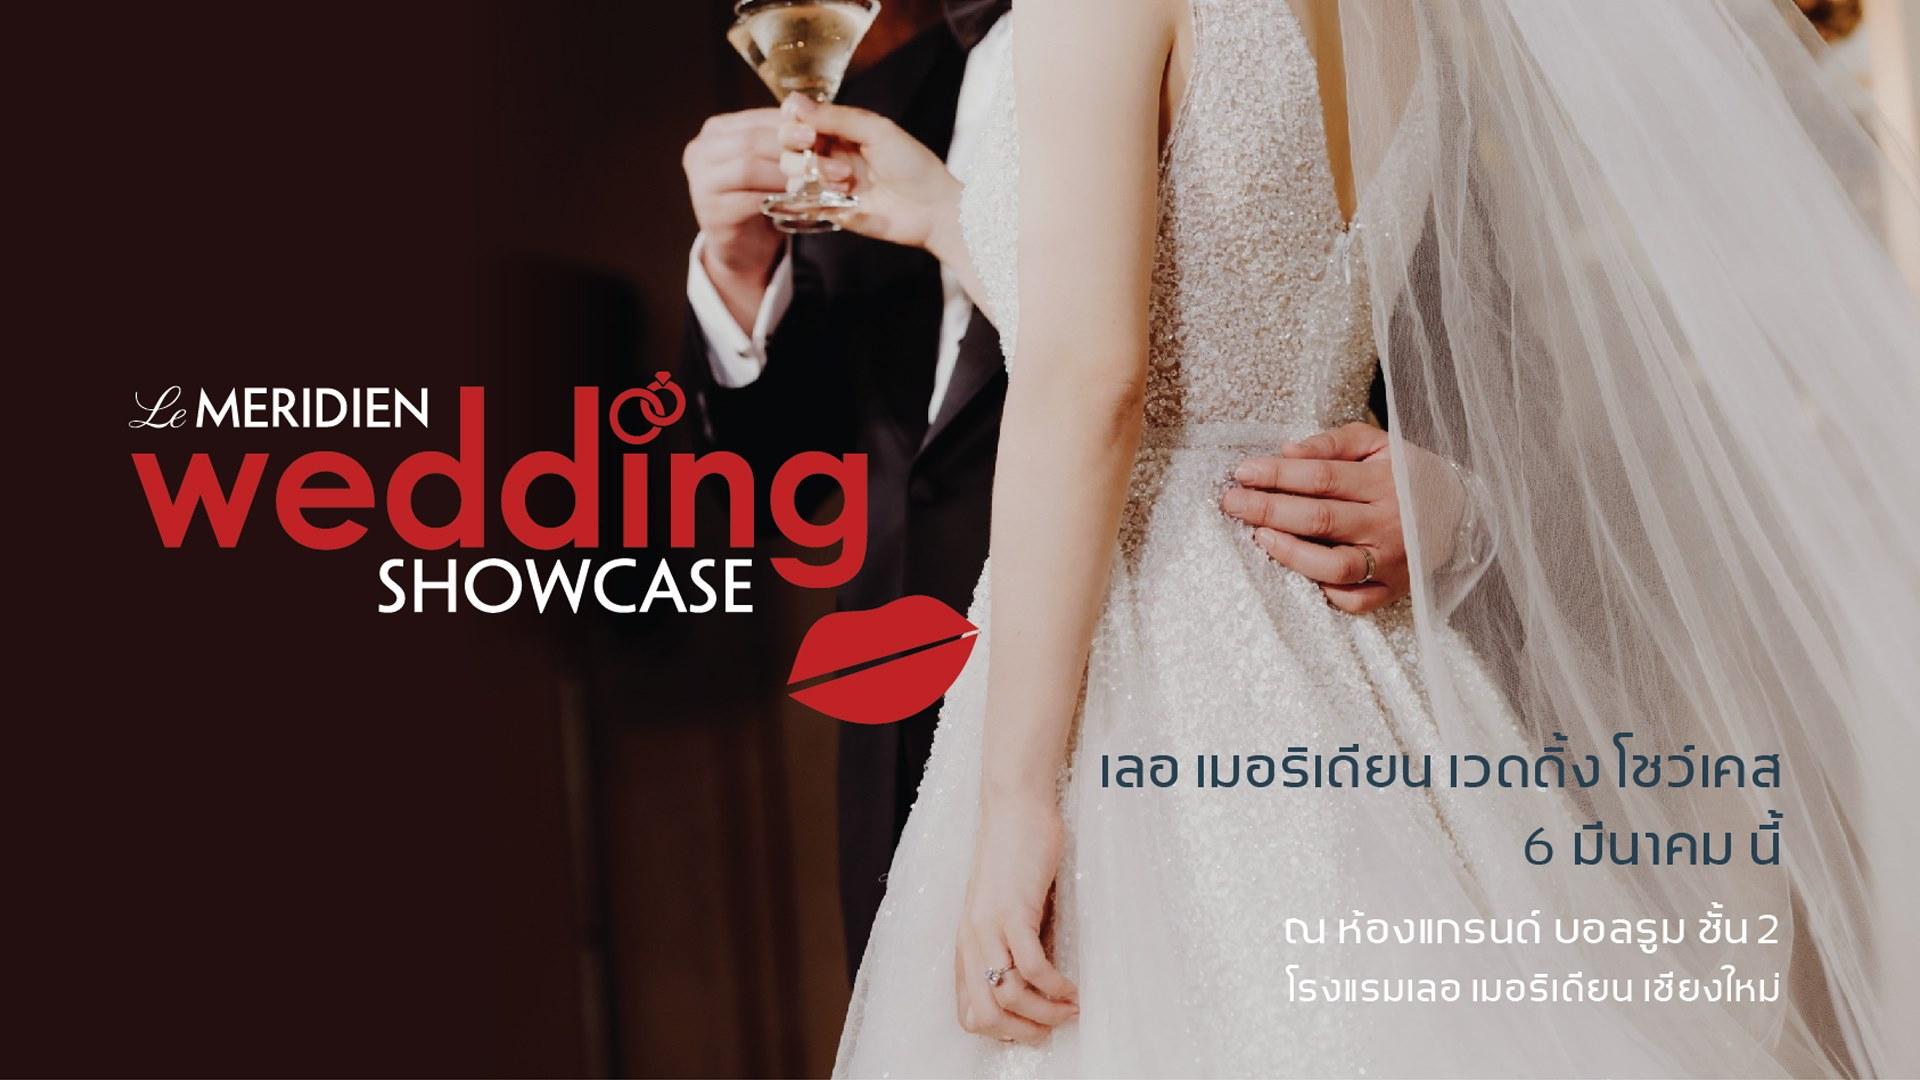 Le Meridien Wedding Showcase 2021 พบกันวันเสาร์ที่ 6 มีนาคม 2564 นี้ ตั้งแต่เวลา 10.00 – 18.00 น. ที่ห้องแกรนด์ บอลรูม ชั้น 2 โรงแรมเลอ เมอริเดียน เชียงใหม่